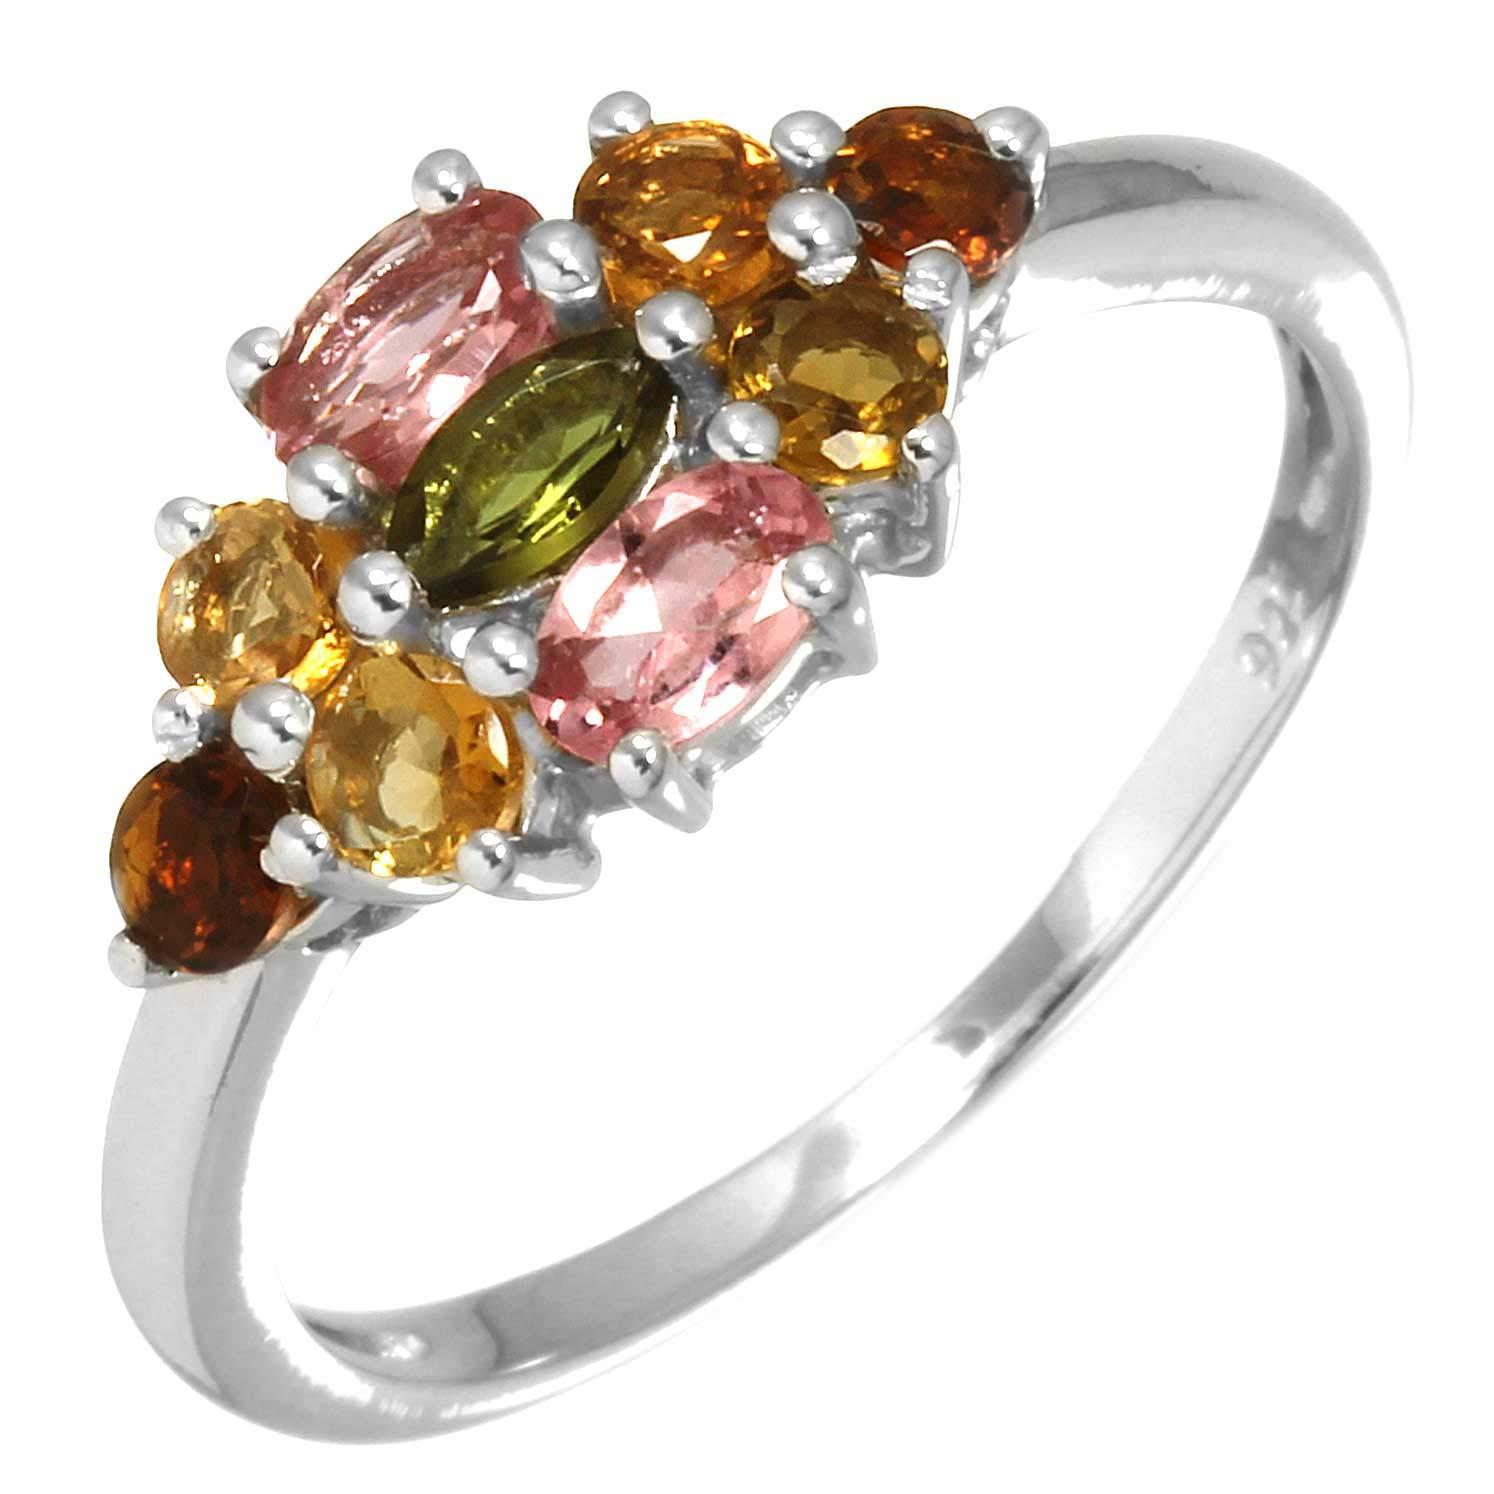 Solid 925 Sterling Silver Ring Natural Multi Tourmaline Gemstone Stylish Jewelry Size 9.5